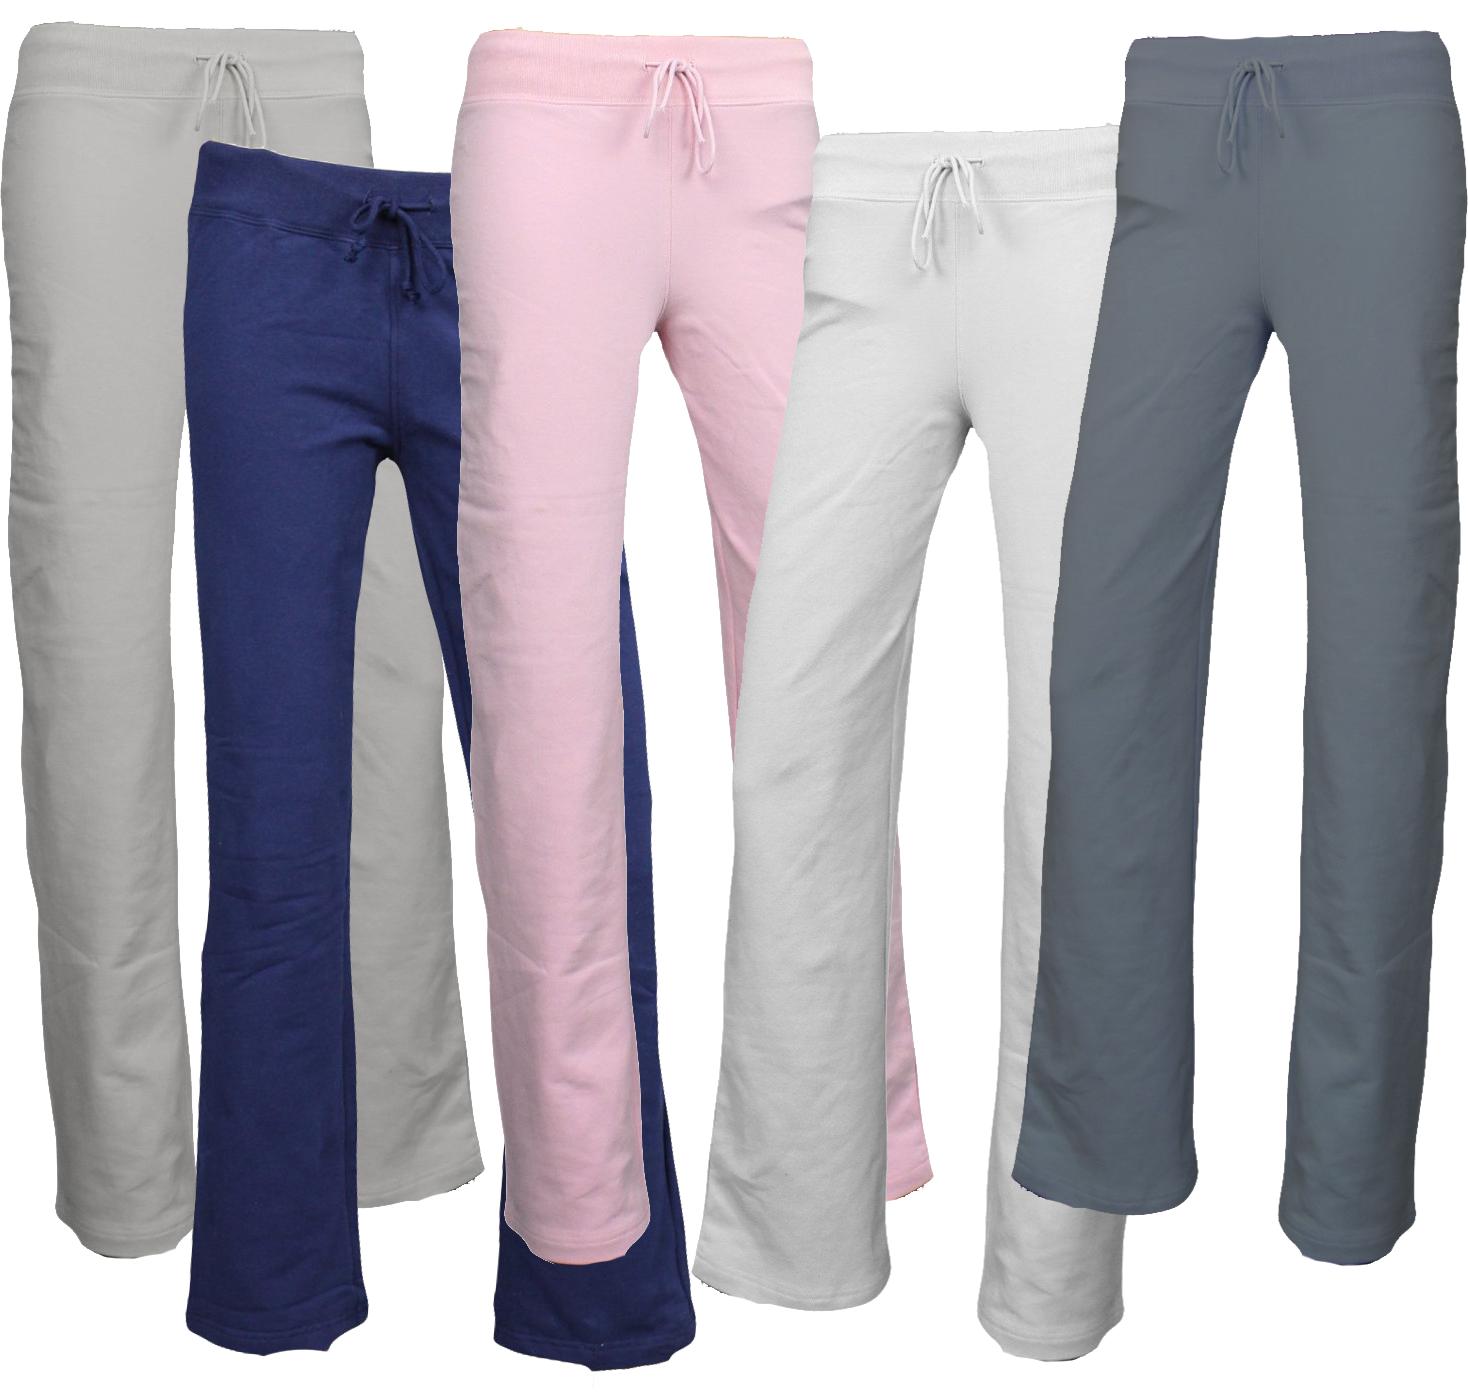 Reebok Womens Active Fitness Fleece Spandex Pants